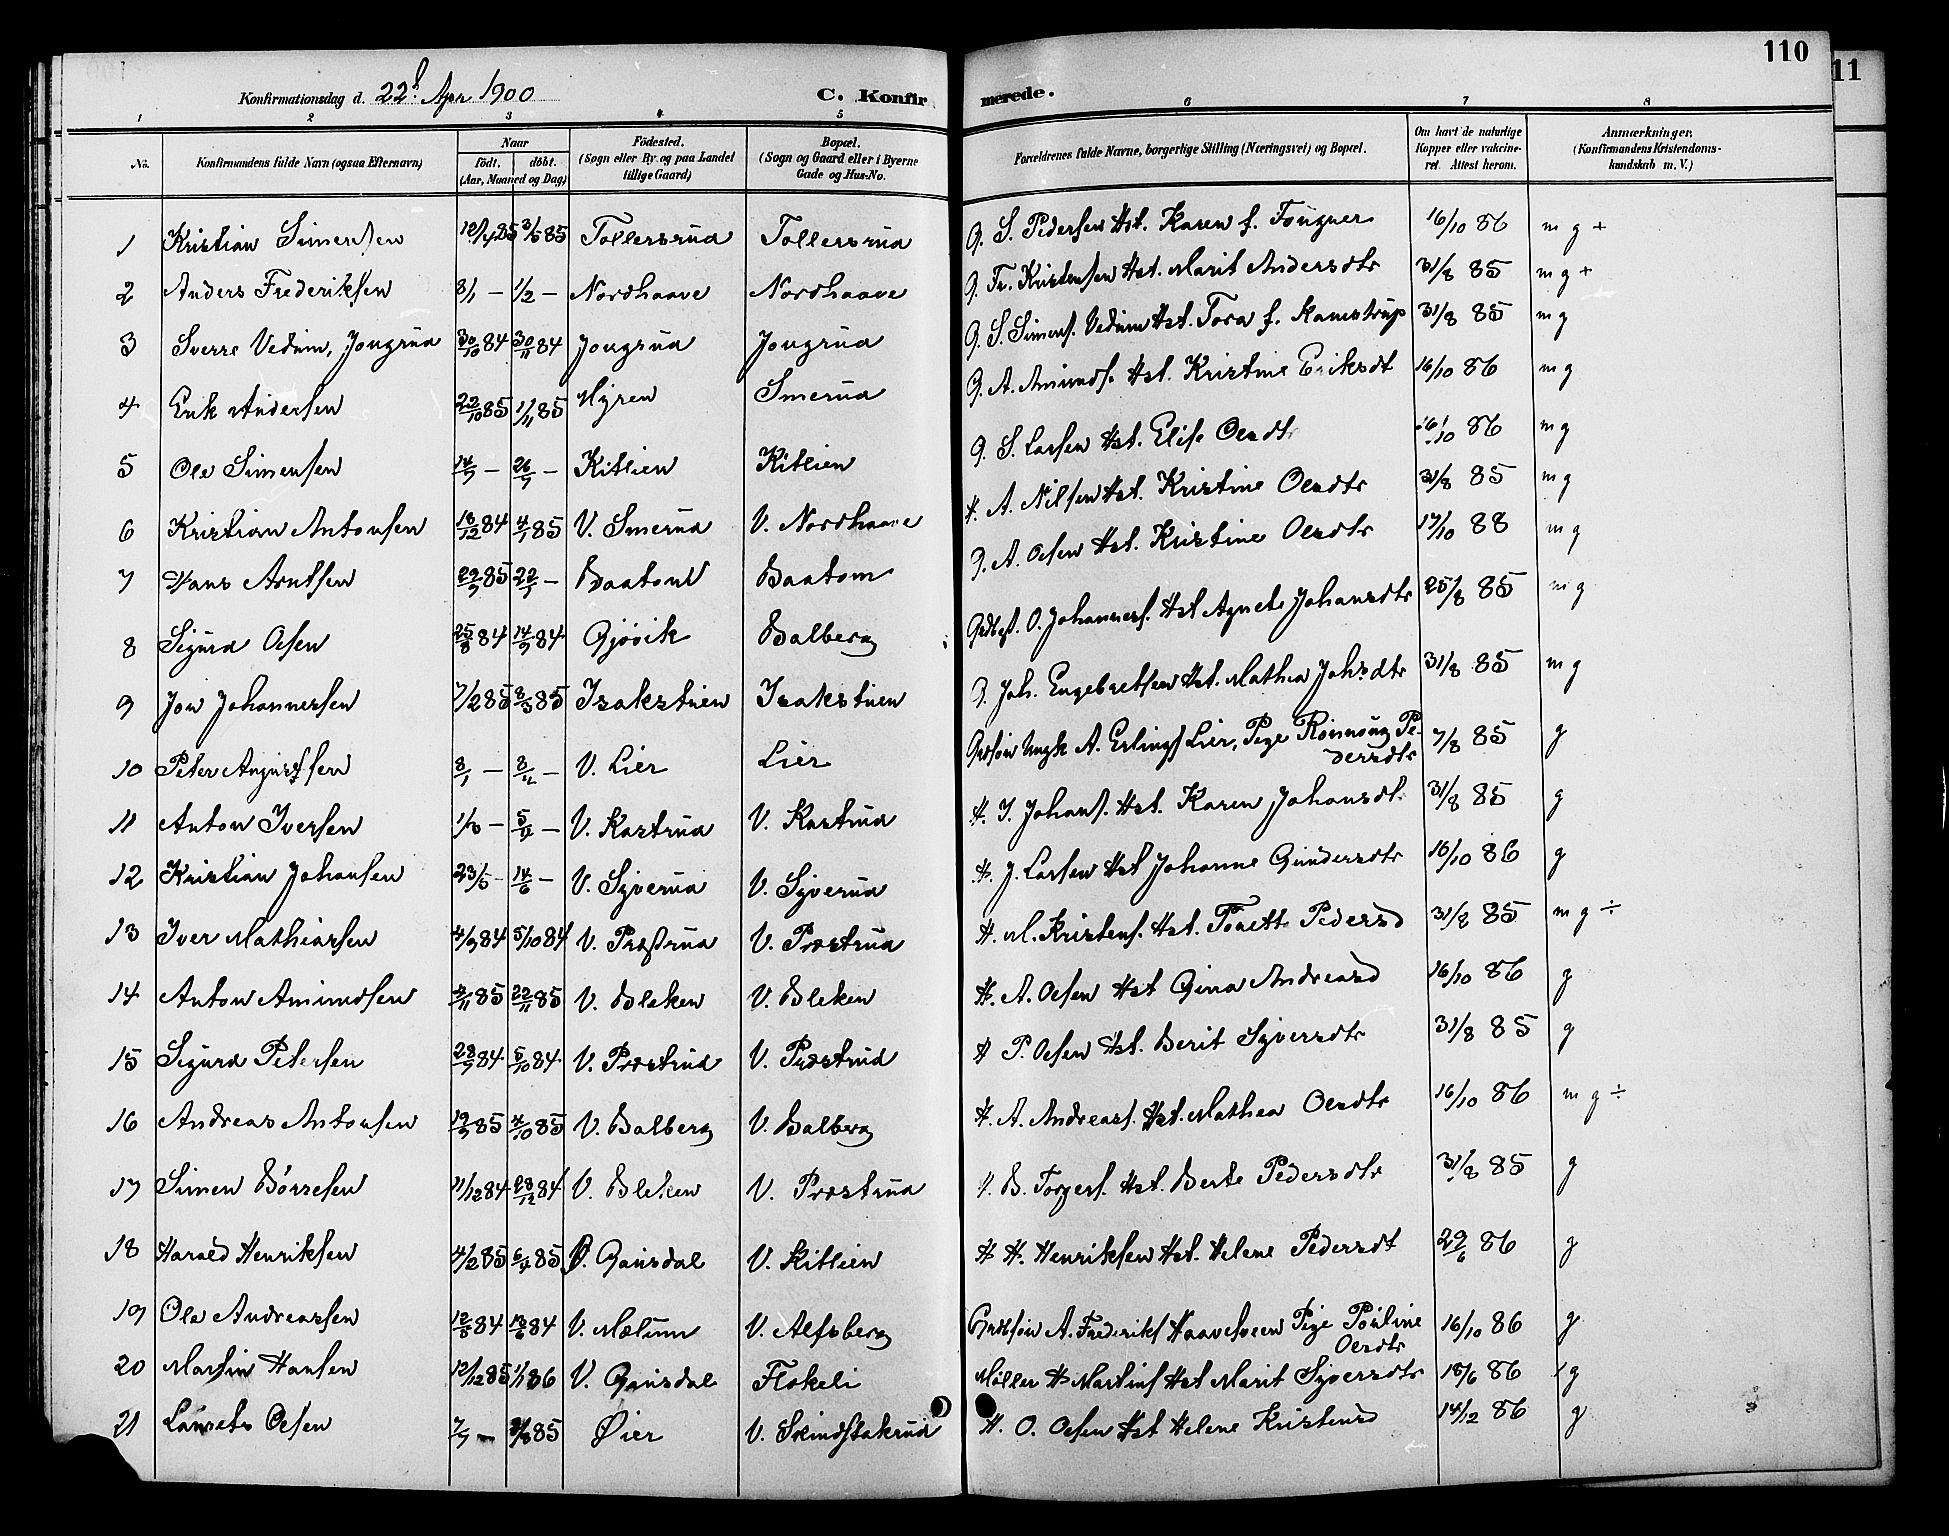 SAH, Fåberg prestekontor, Klokkerbok nr. 10, 1892-1900, s. 110